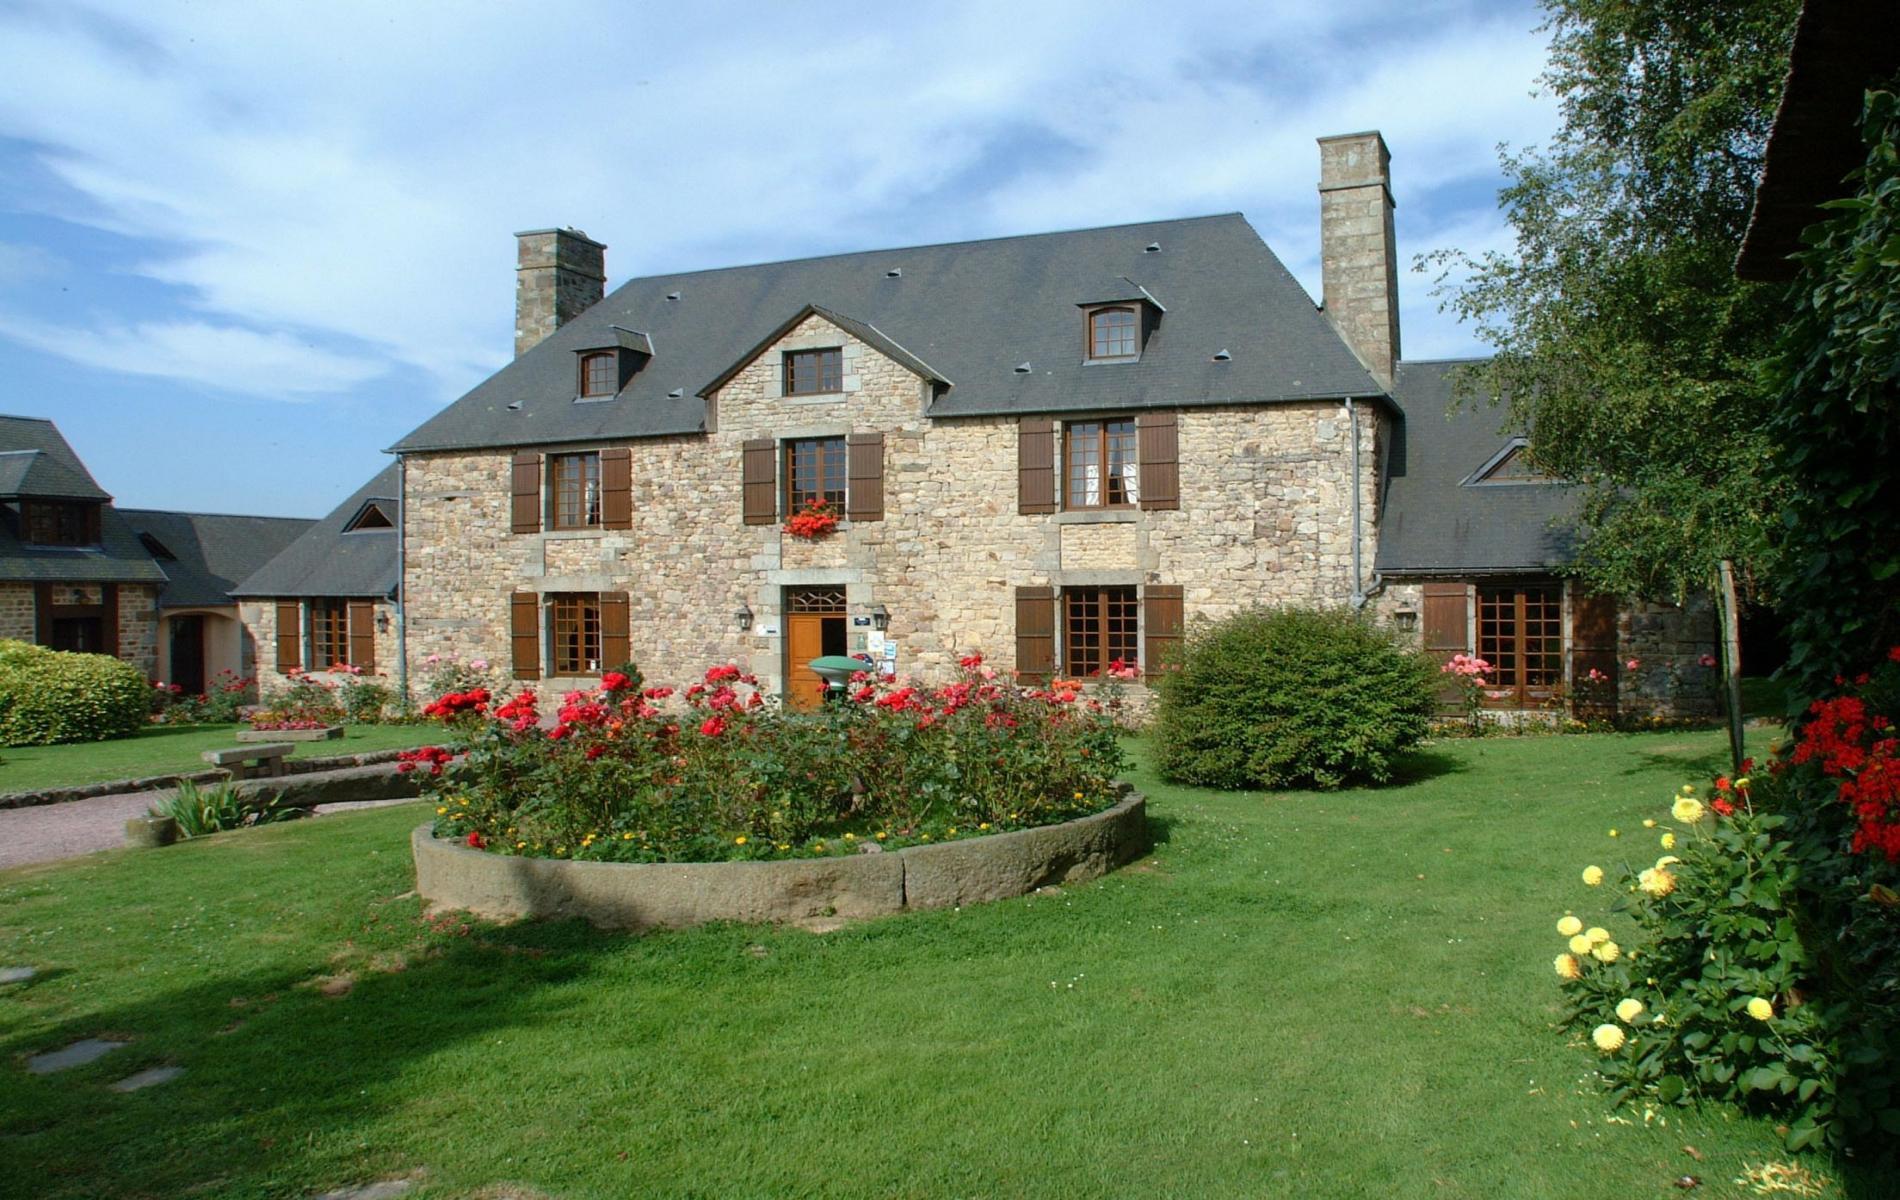 Manoir de l'Acherie - Hotel en Normandie